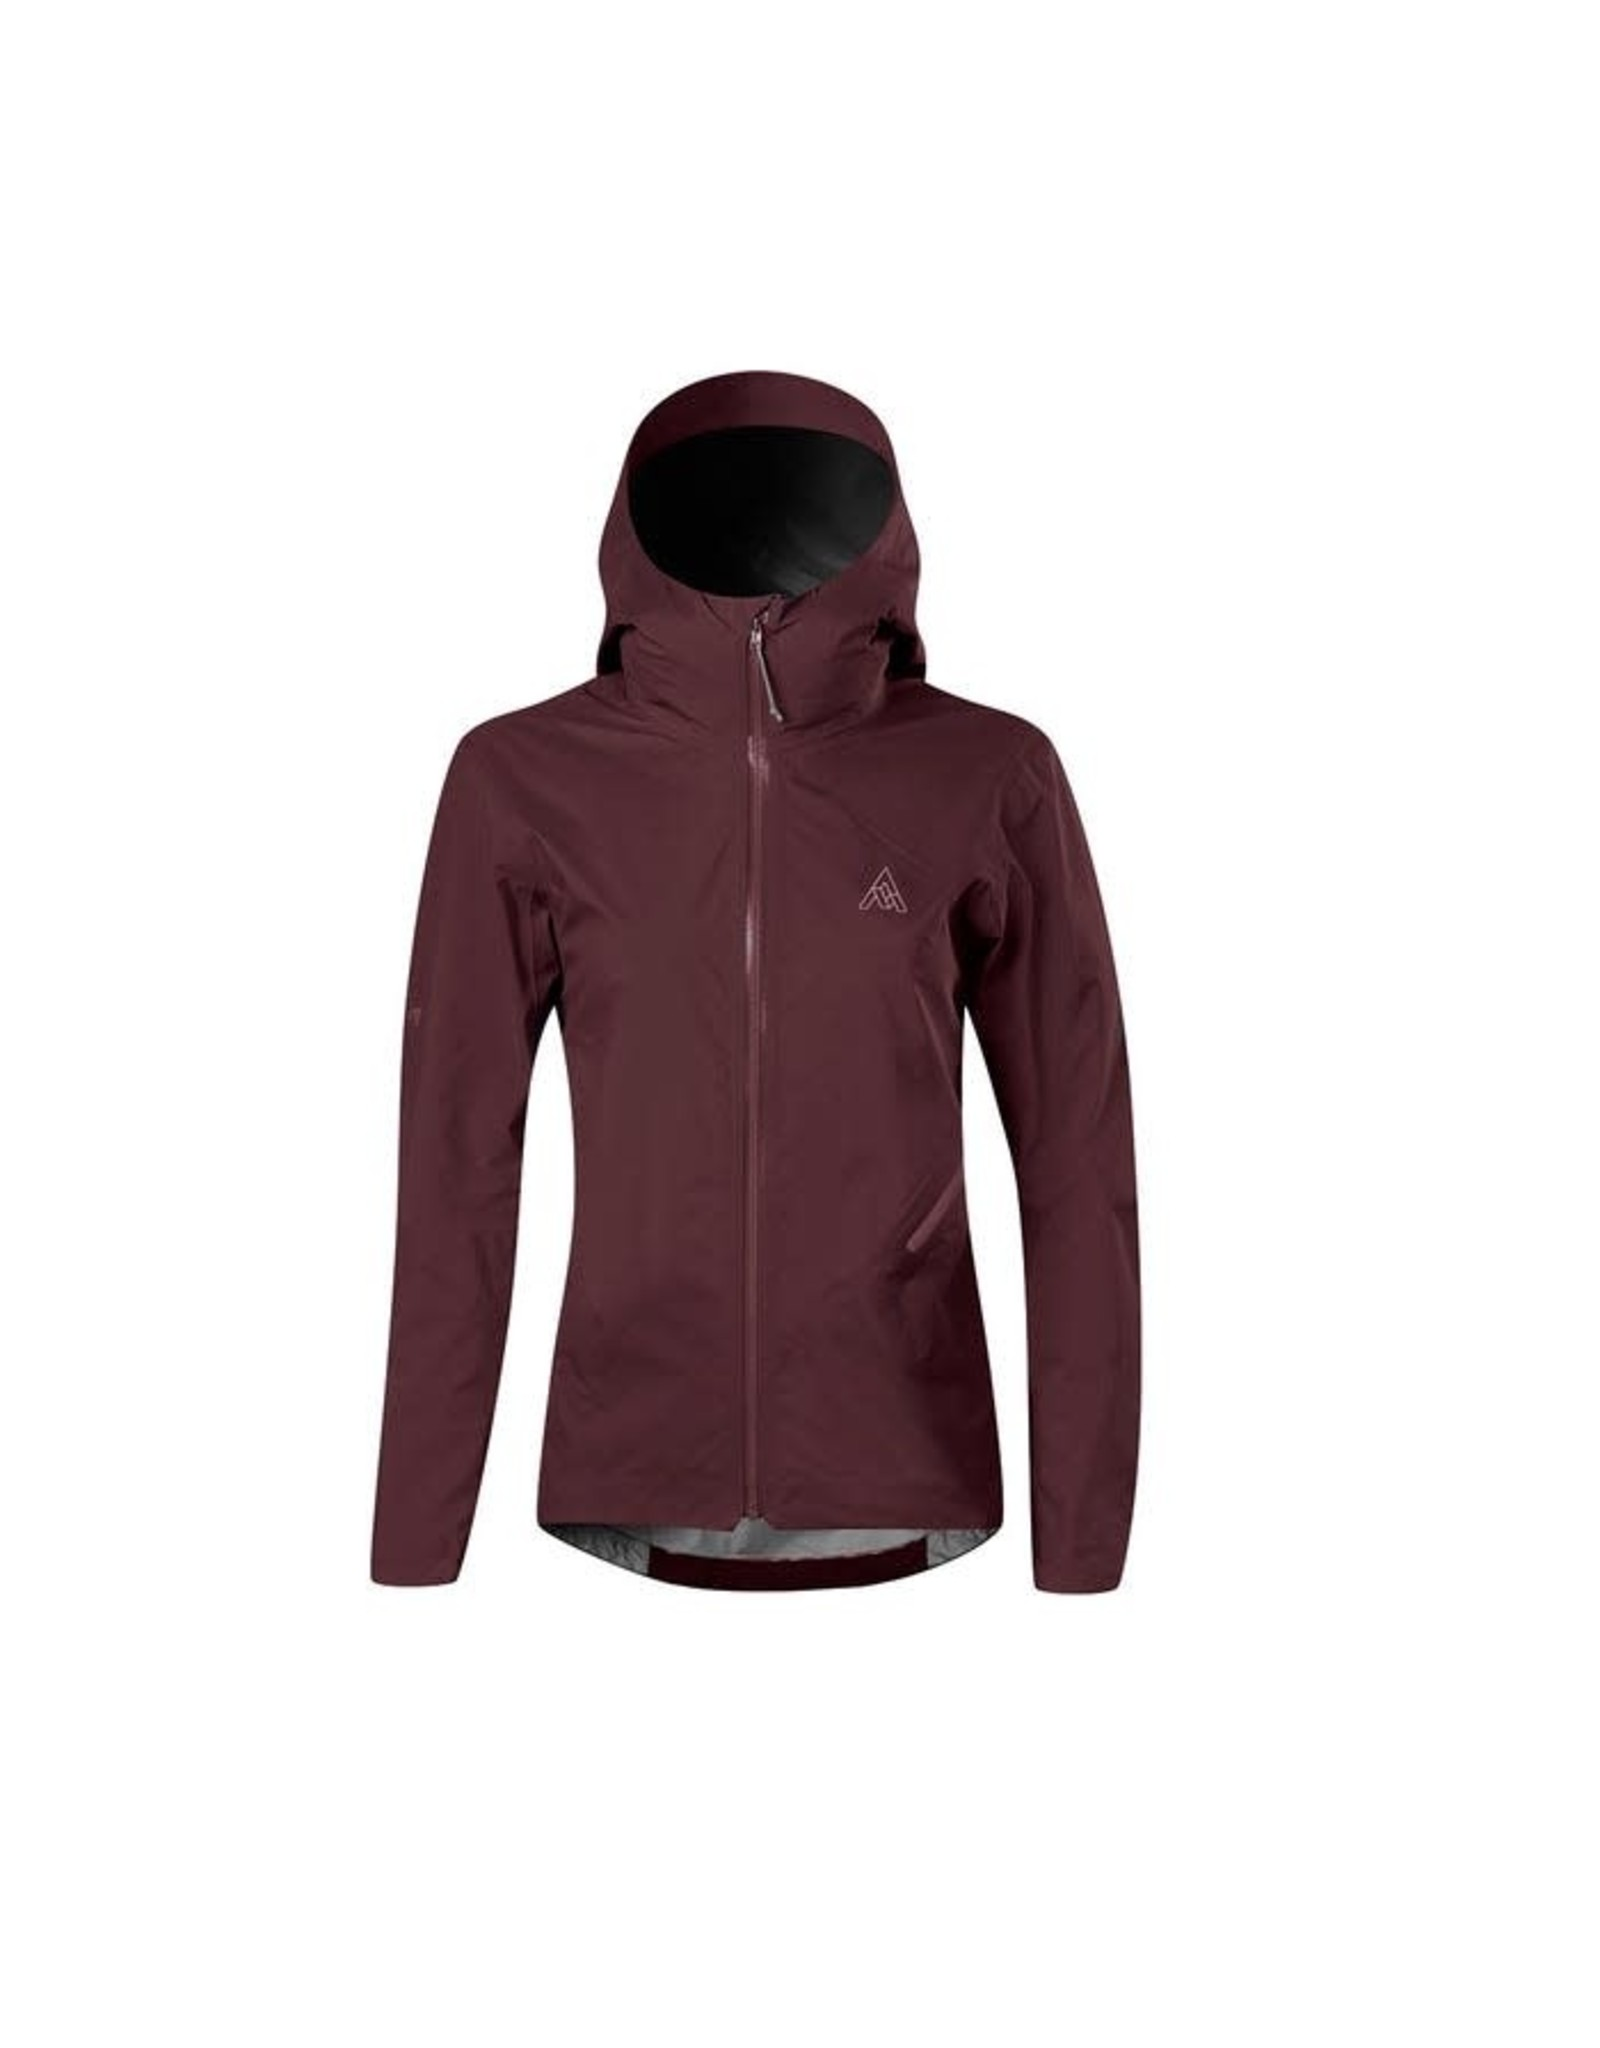 7MESH 7MESH - Copilot Jacket Port Women's XS